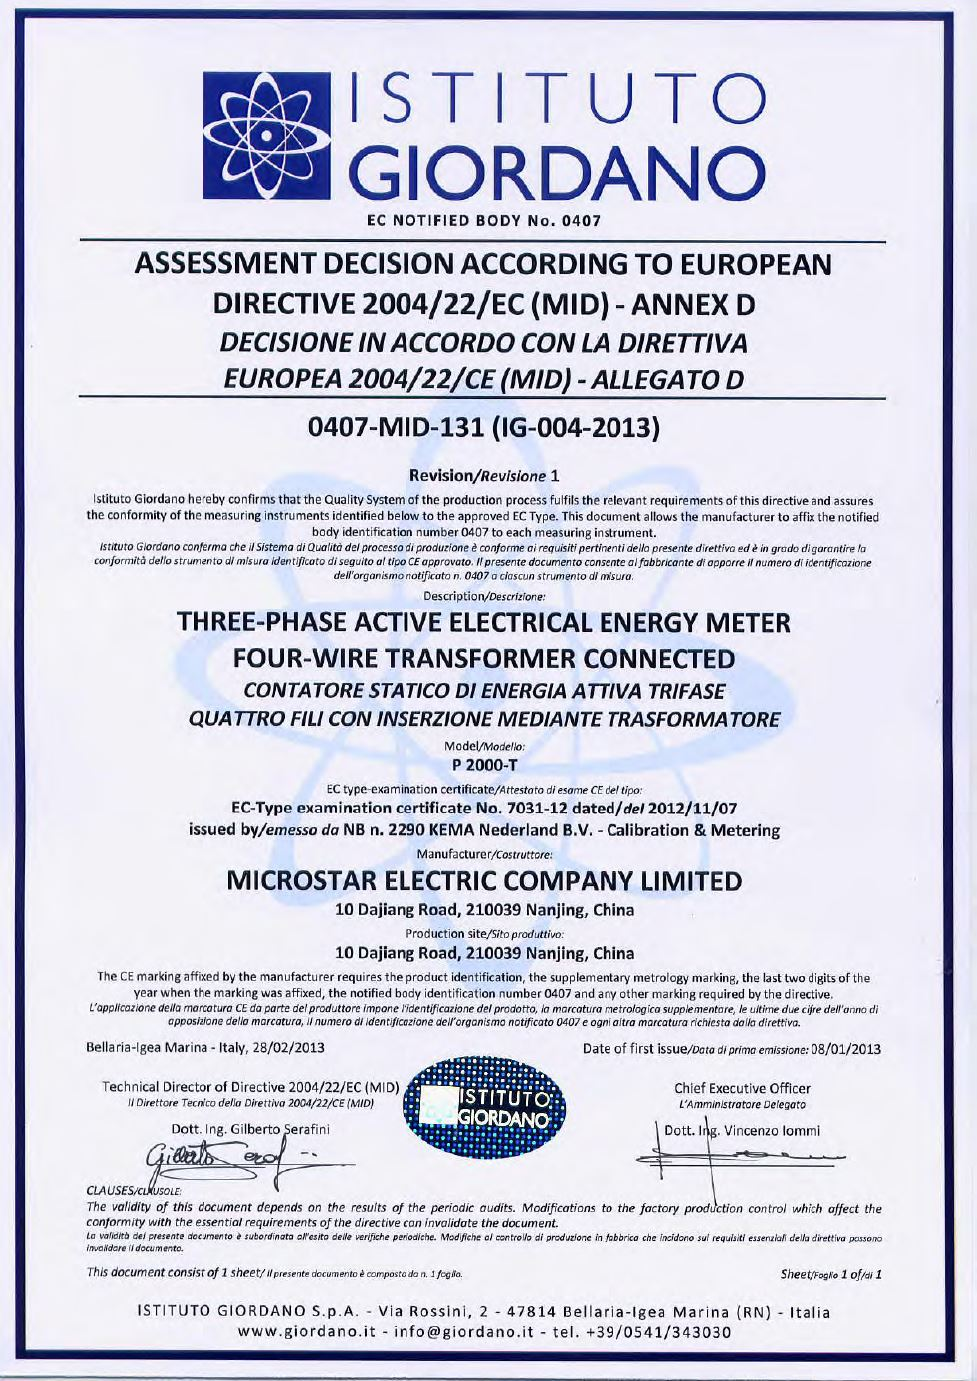 P2000-T MID Module D Certificate